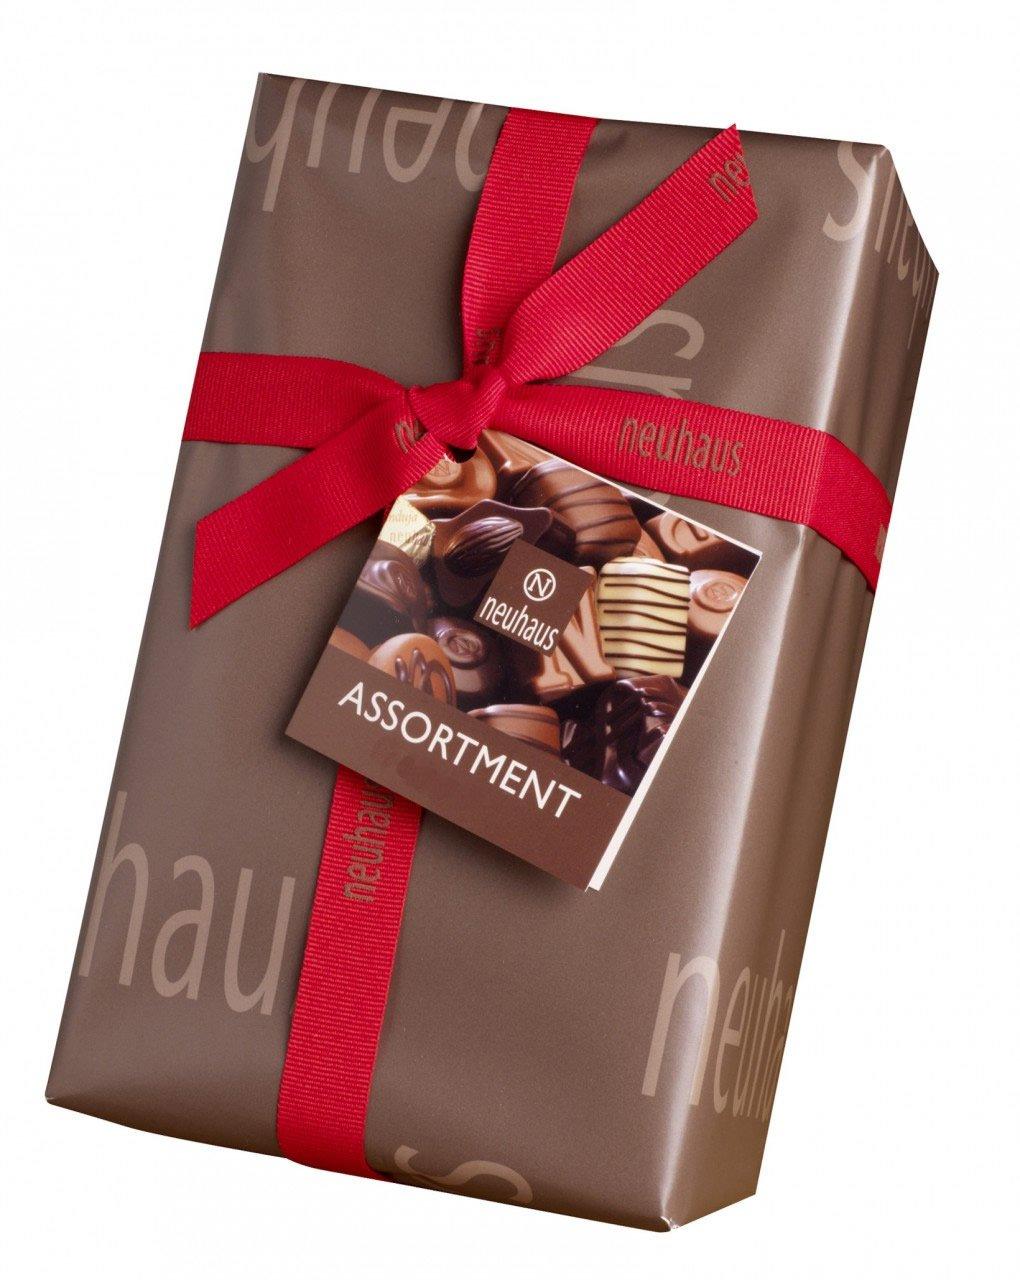 Amazon.com : Neuhaus Chocolate Ballotin 1/2 lb : Chocolate ...